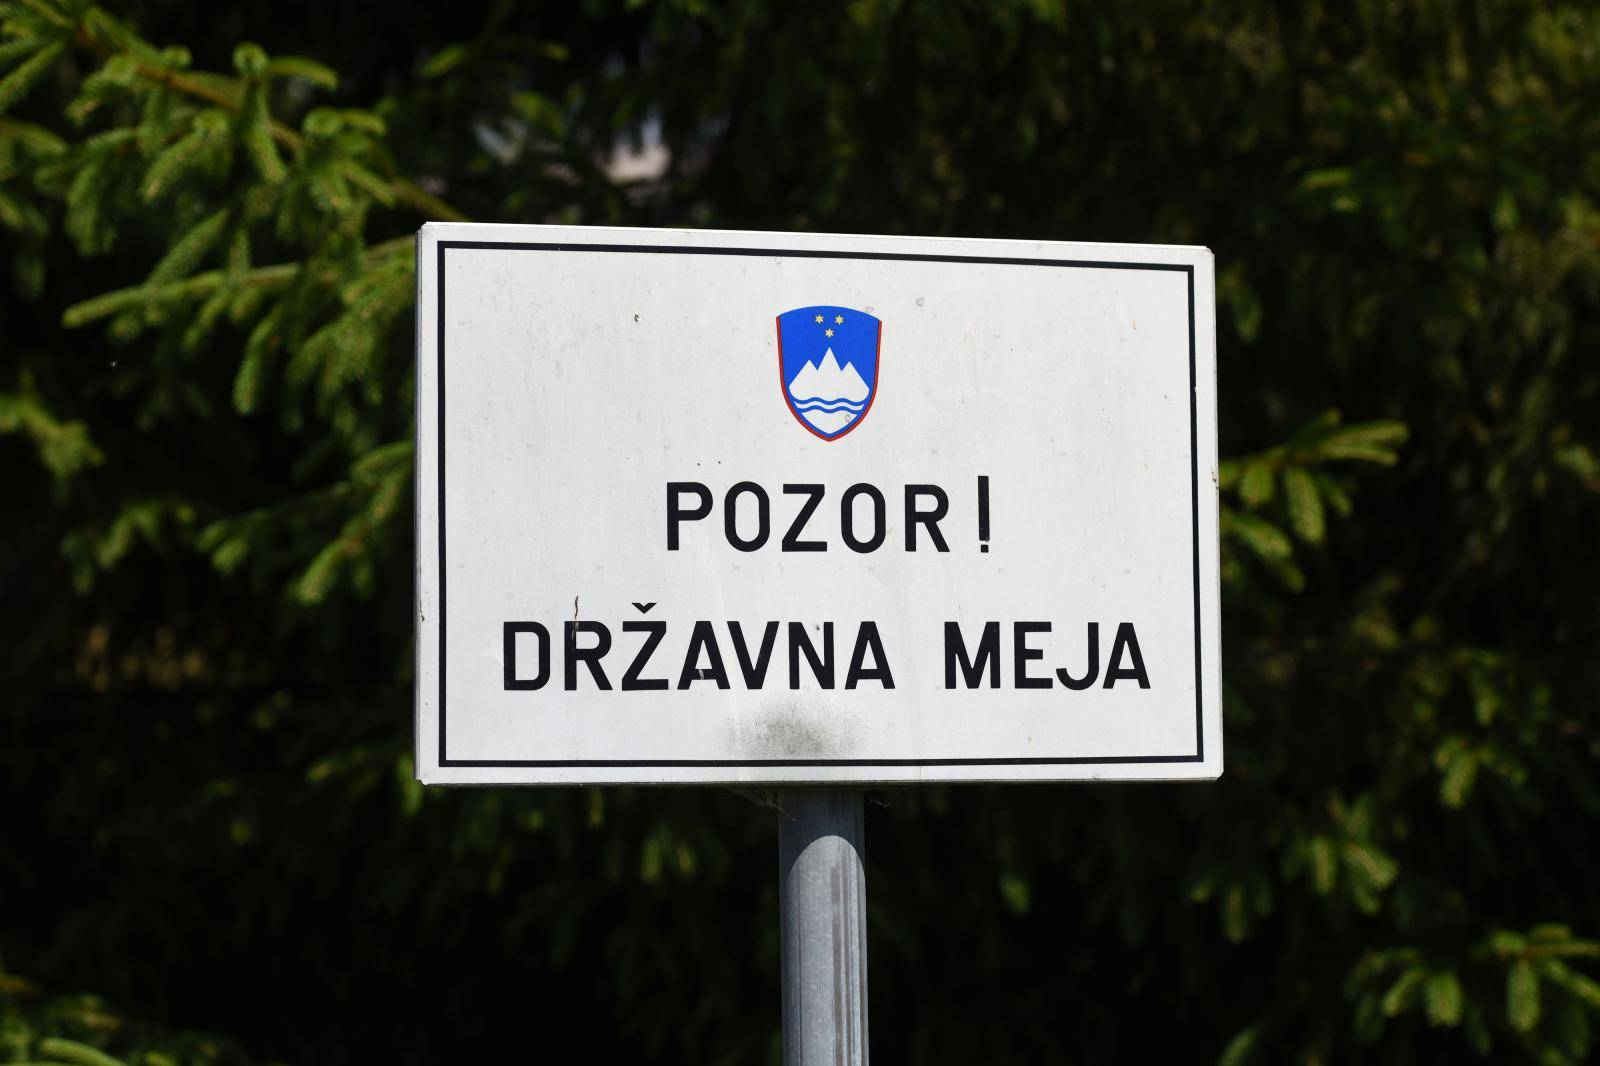 Vojne formacije na slovenskoj granici? 'Imaju ruske oznake'